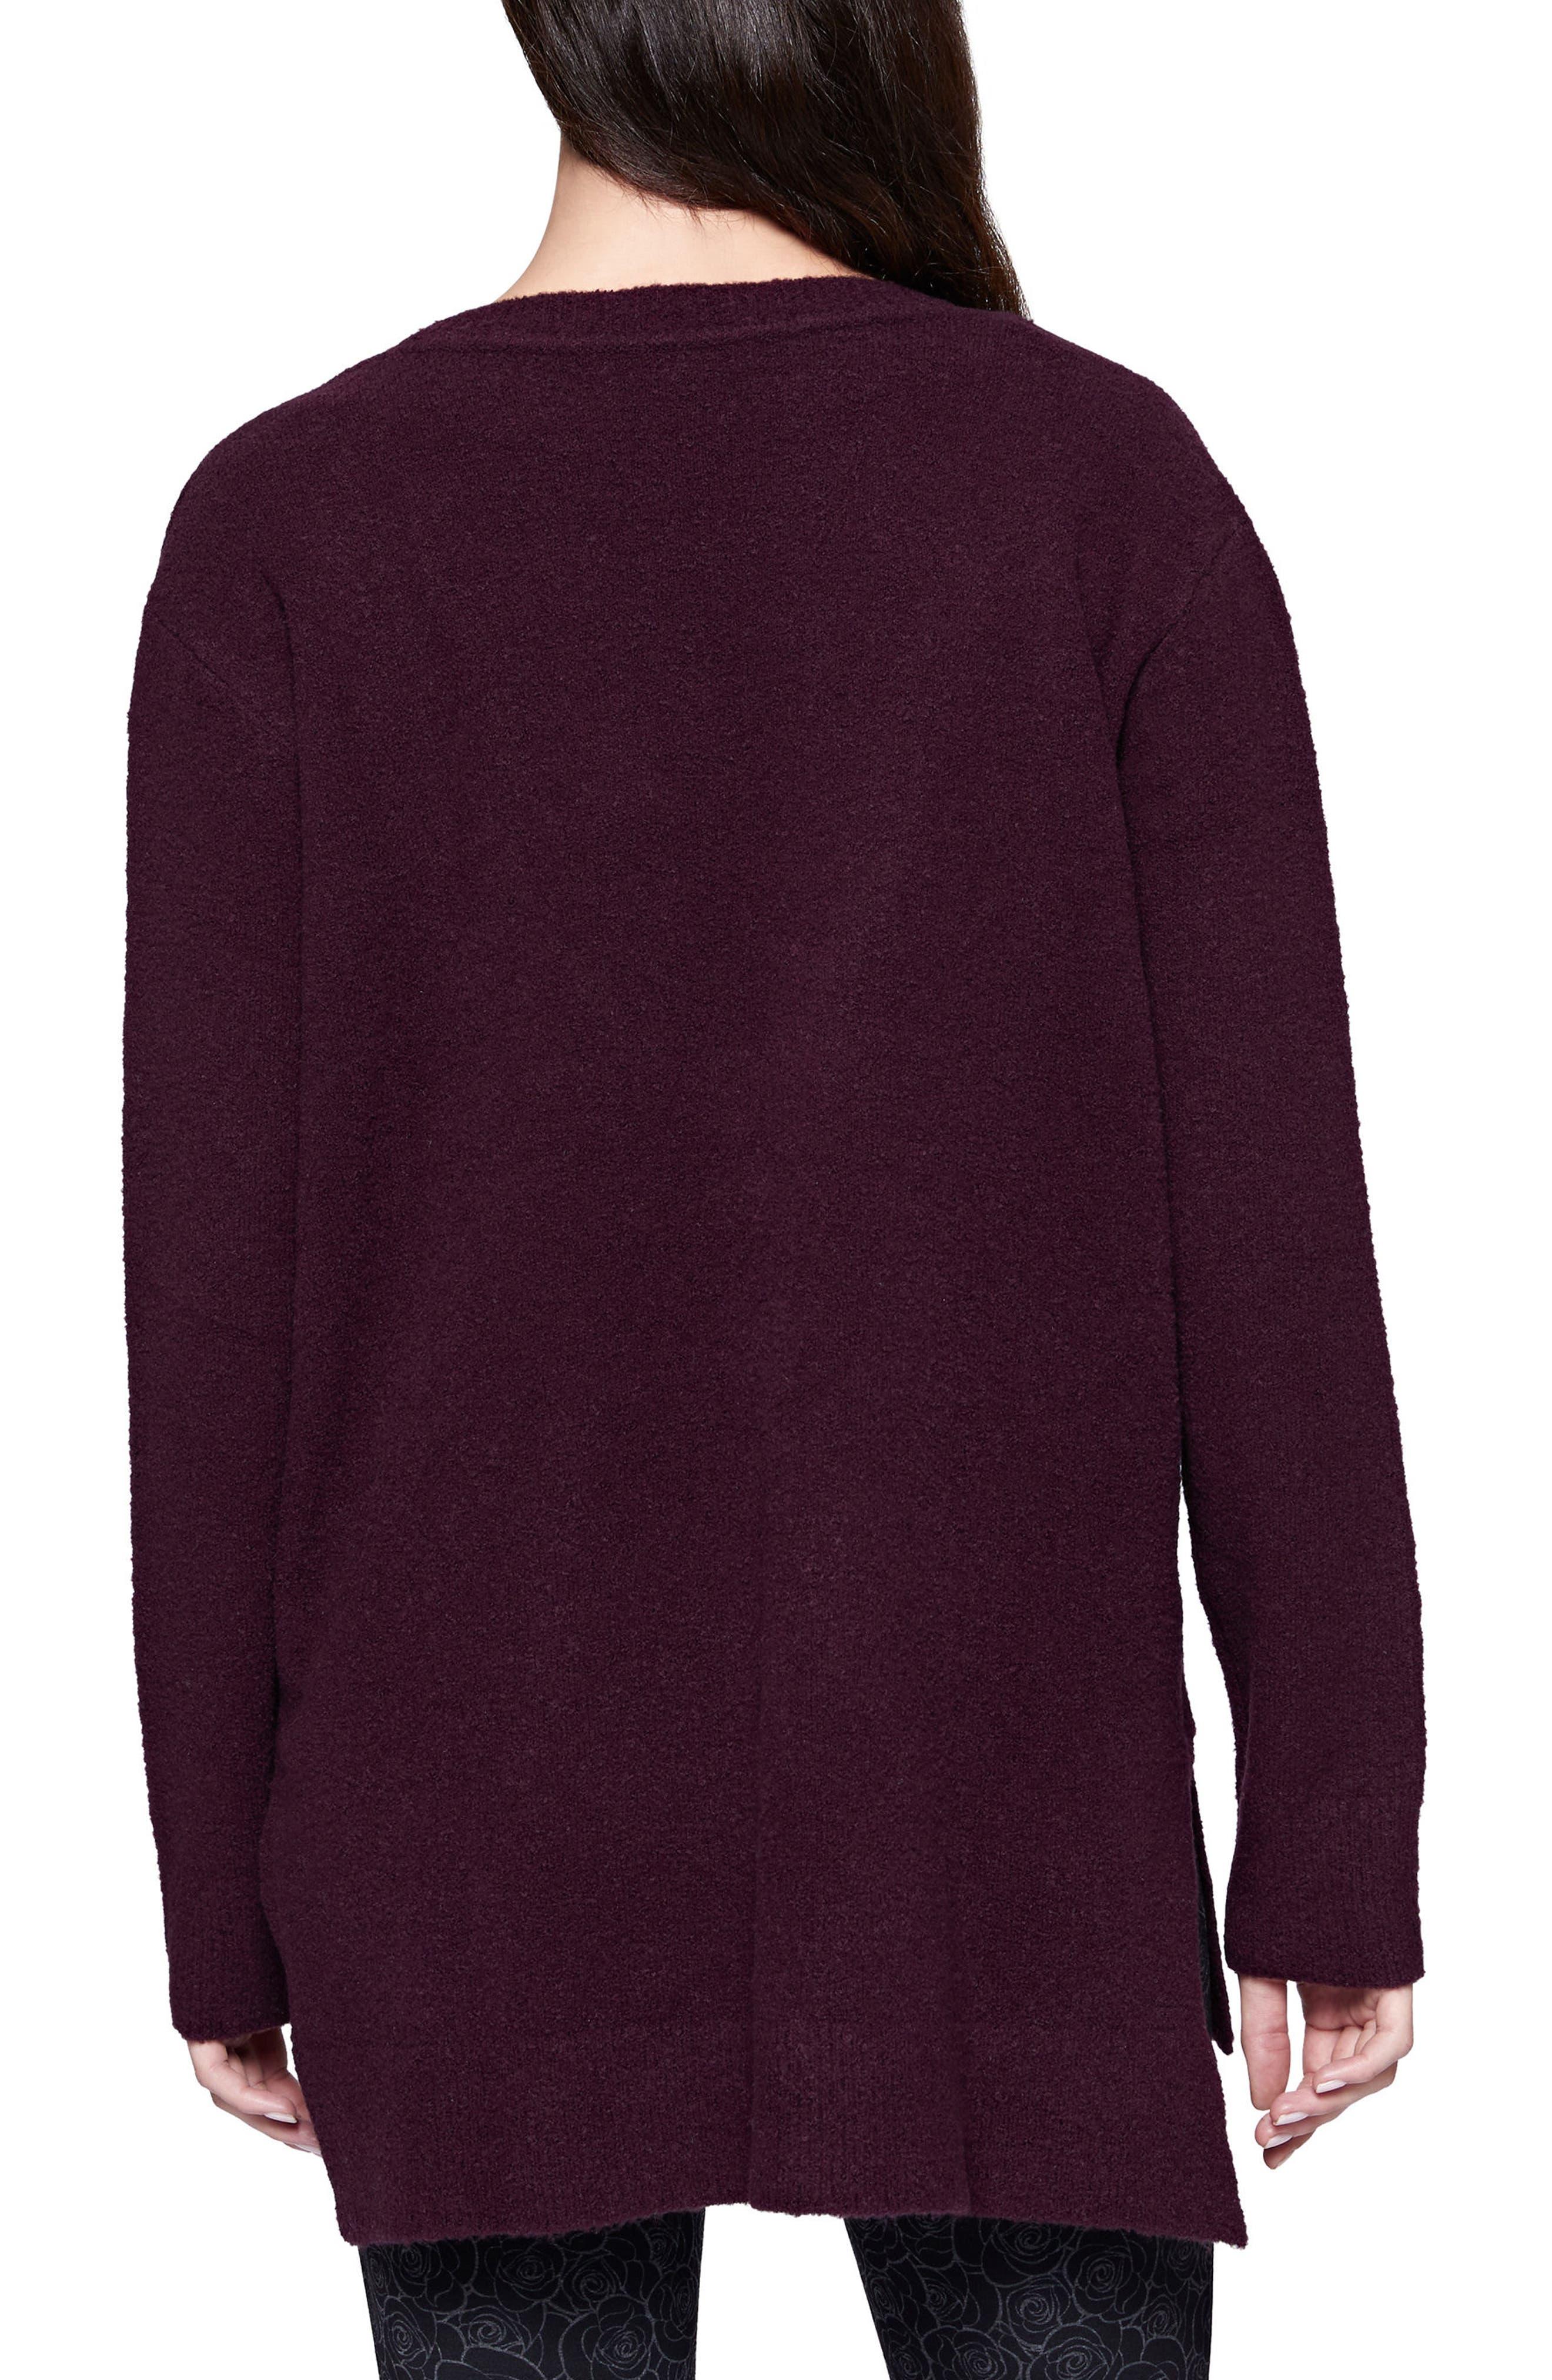 Santuary Delancey V-Neck Sweater,                             Alternate thumbnail 9, color,